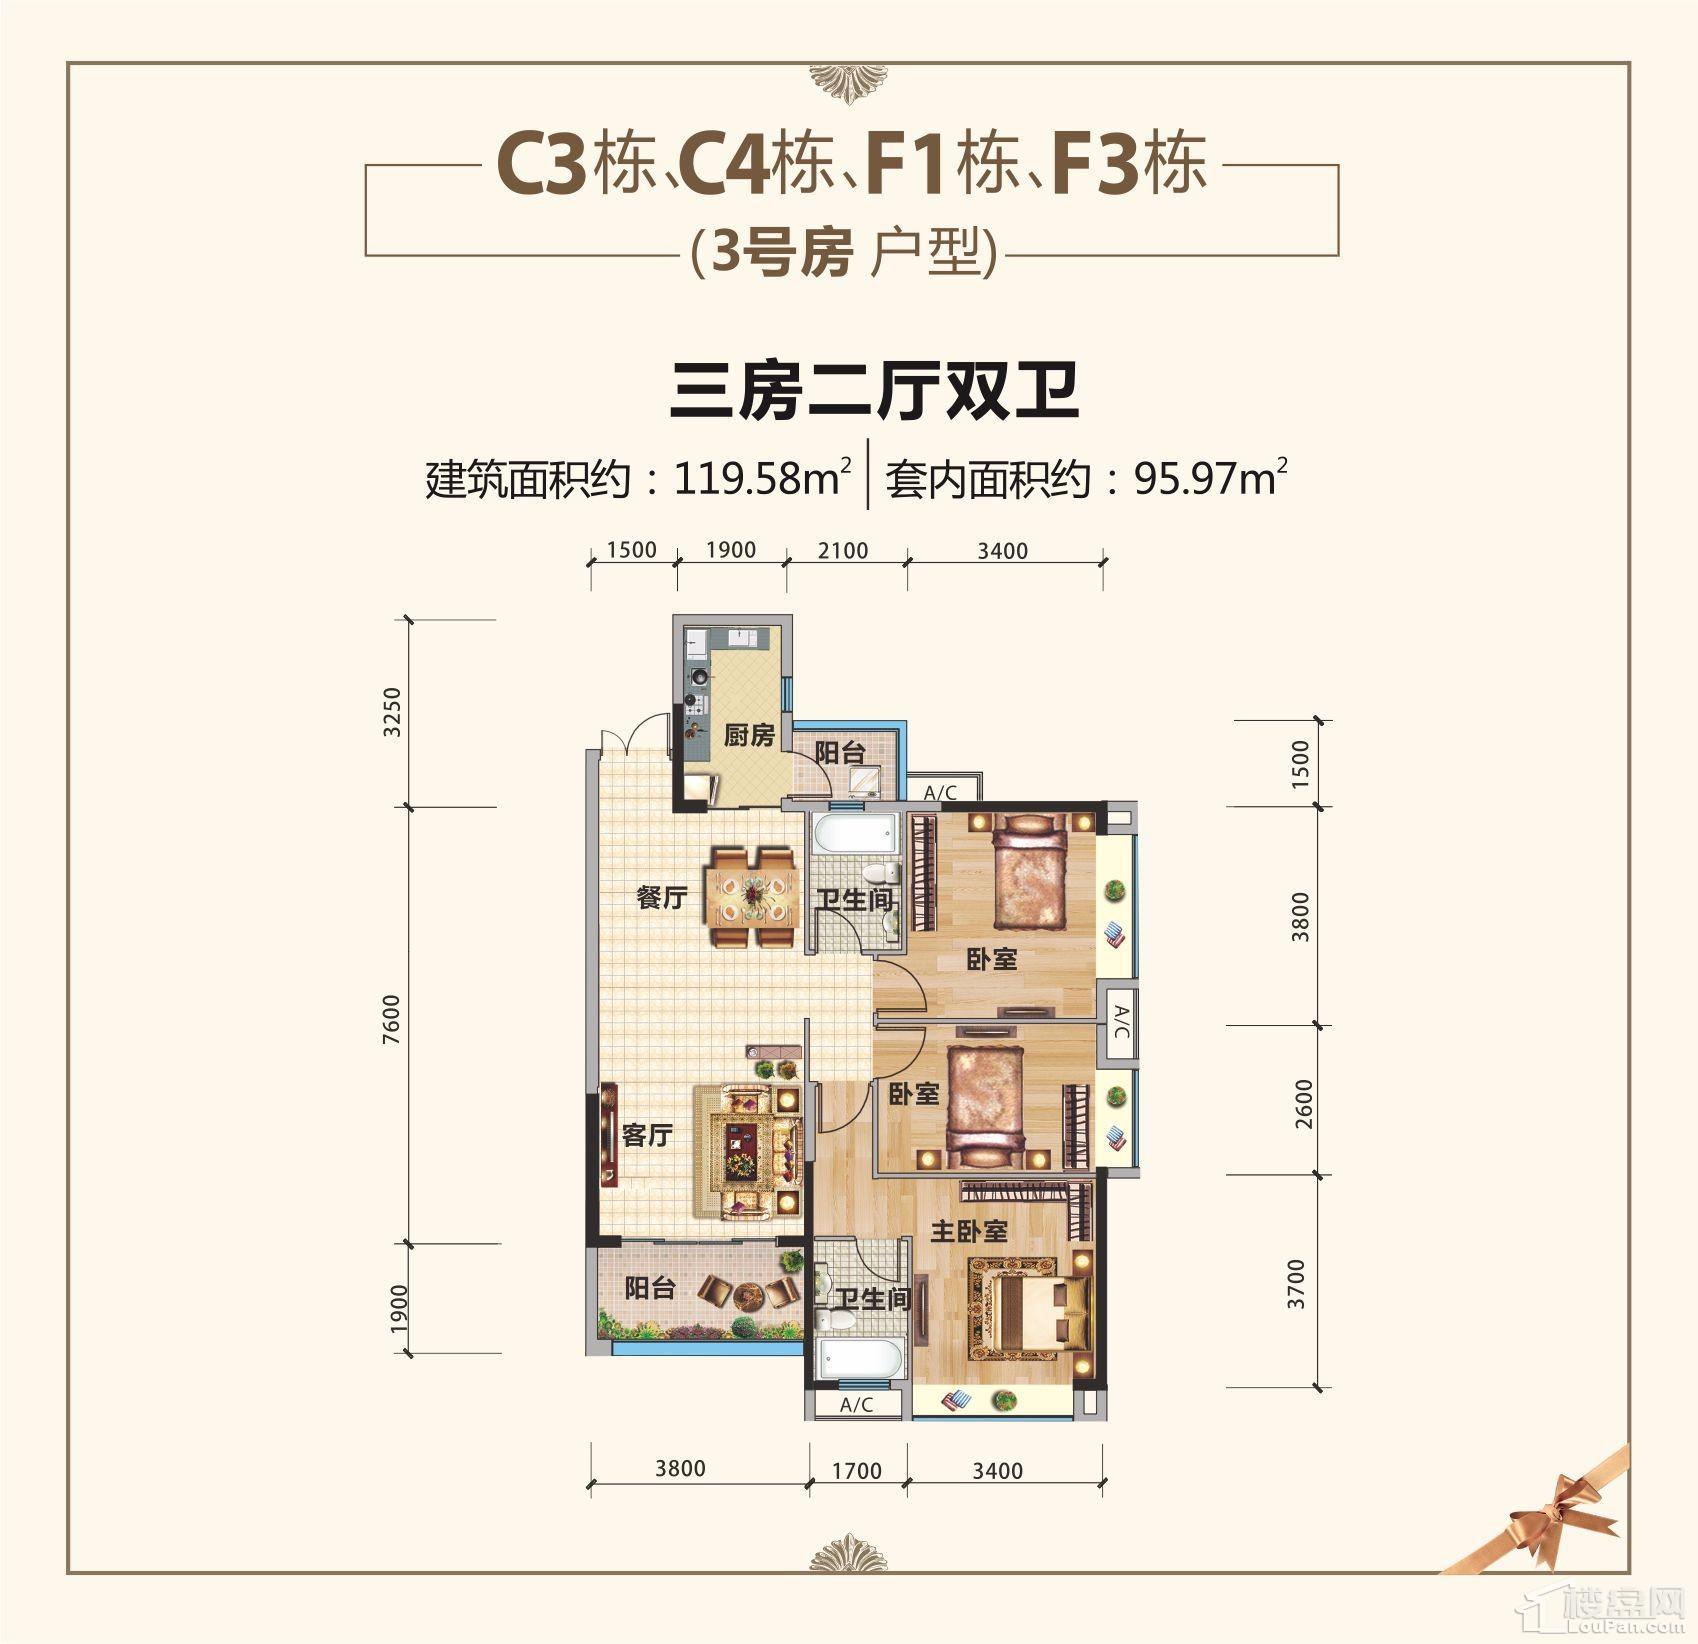 C3栋、C4栋、F1栋、F3栋3号房户型